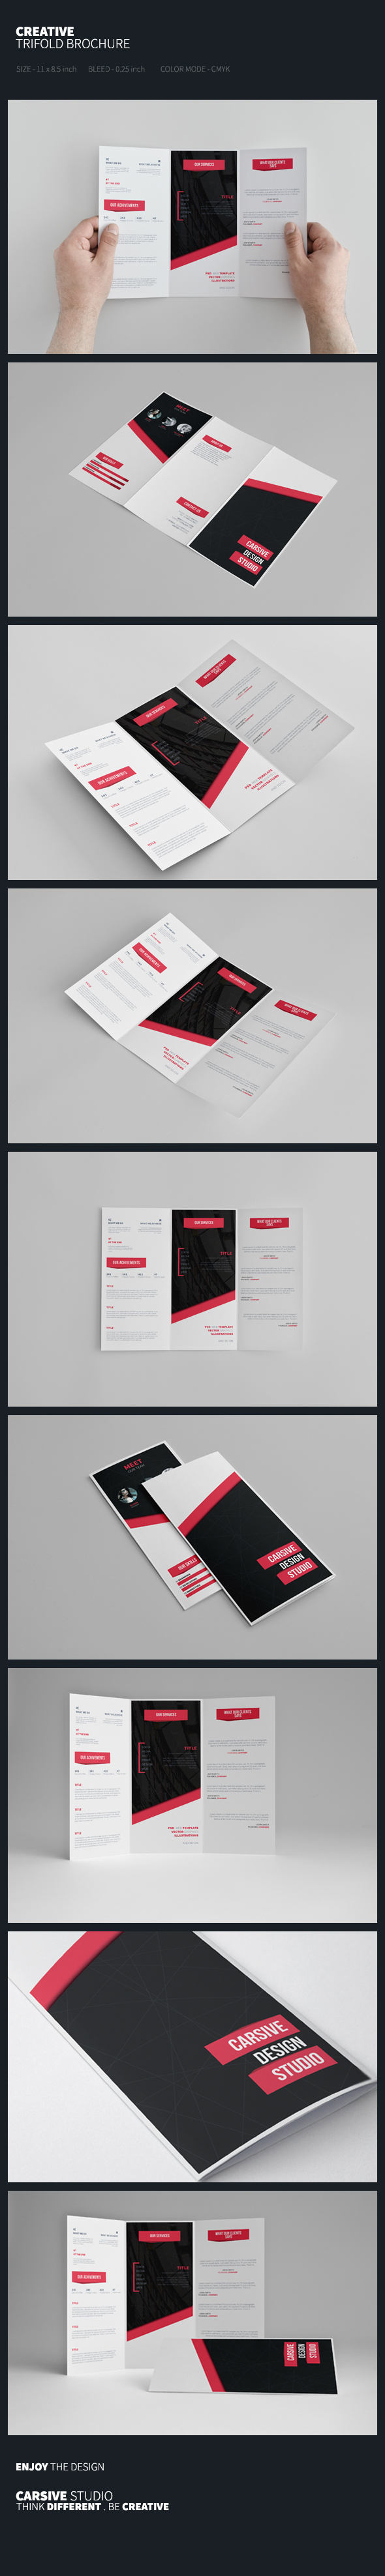 brochure template trifold clean sleek White print black abstract achievement creative corporate